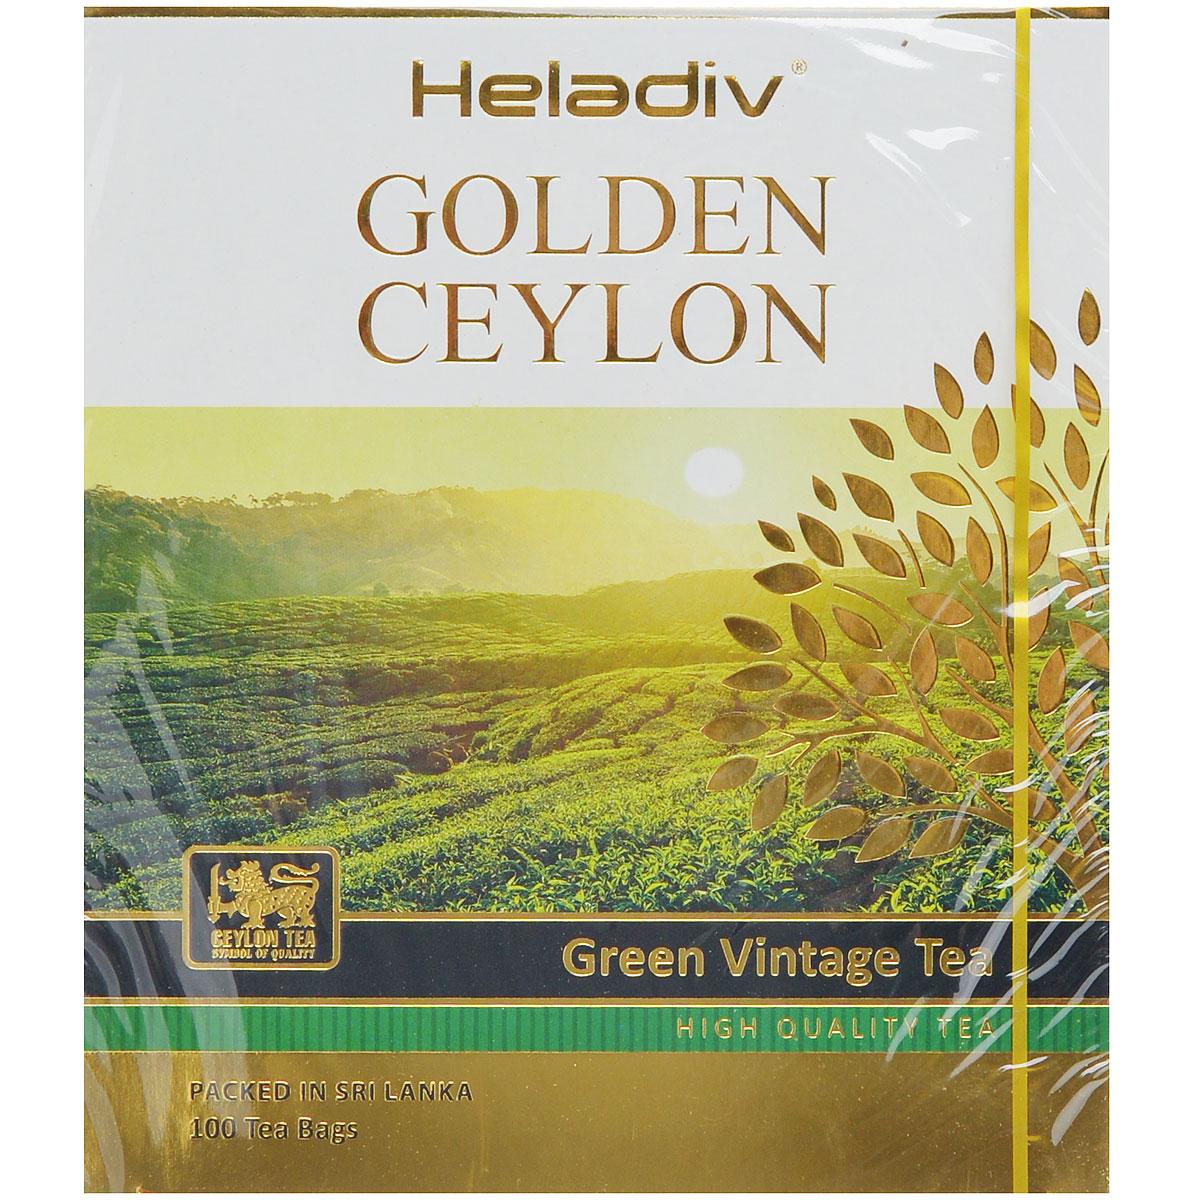 Heladiv Golden Ceylon Vintage Green зеленый пакетированный чай, 100 пакетиков чай зеленый akbar green tea китайский пакетированный